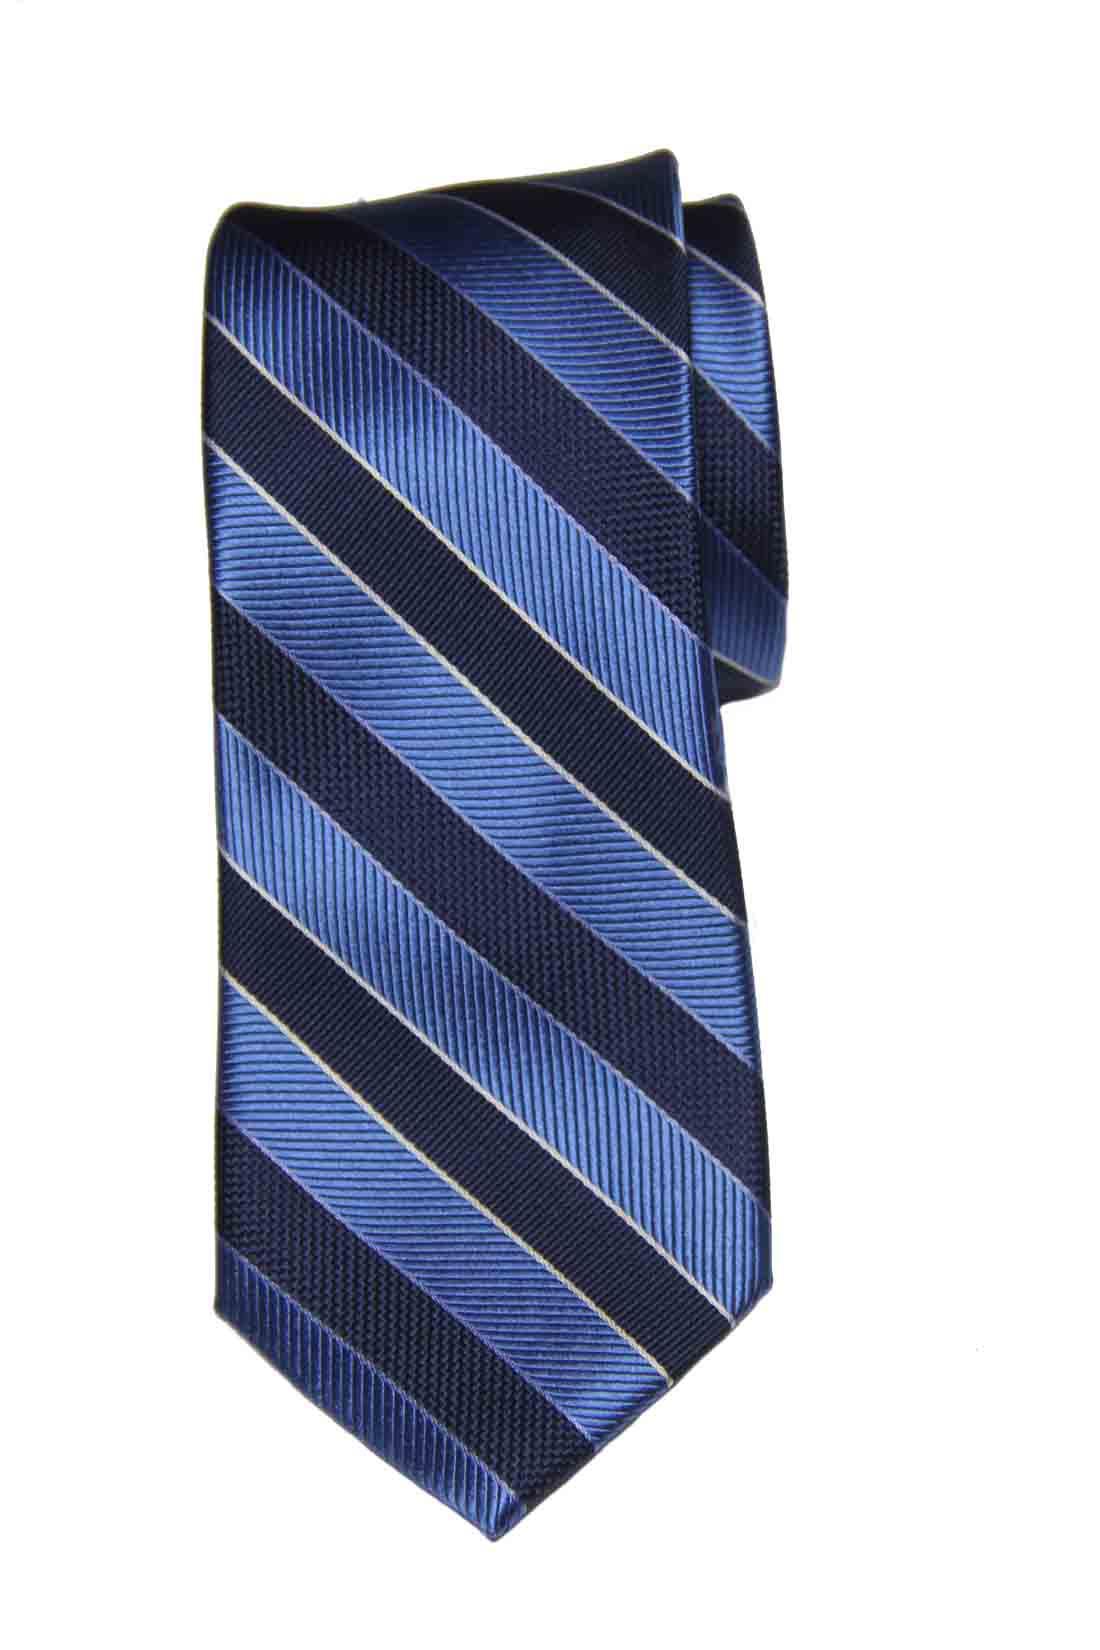 Jos A Bank Silk Tie Repp Stripe Navy Blue White Men's